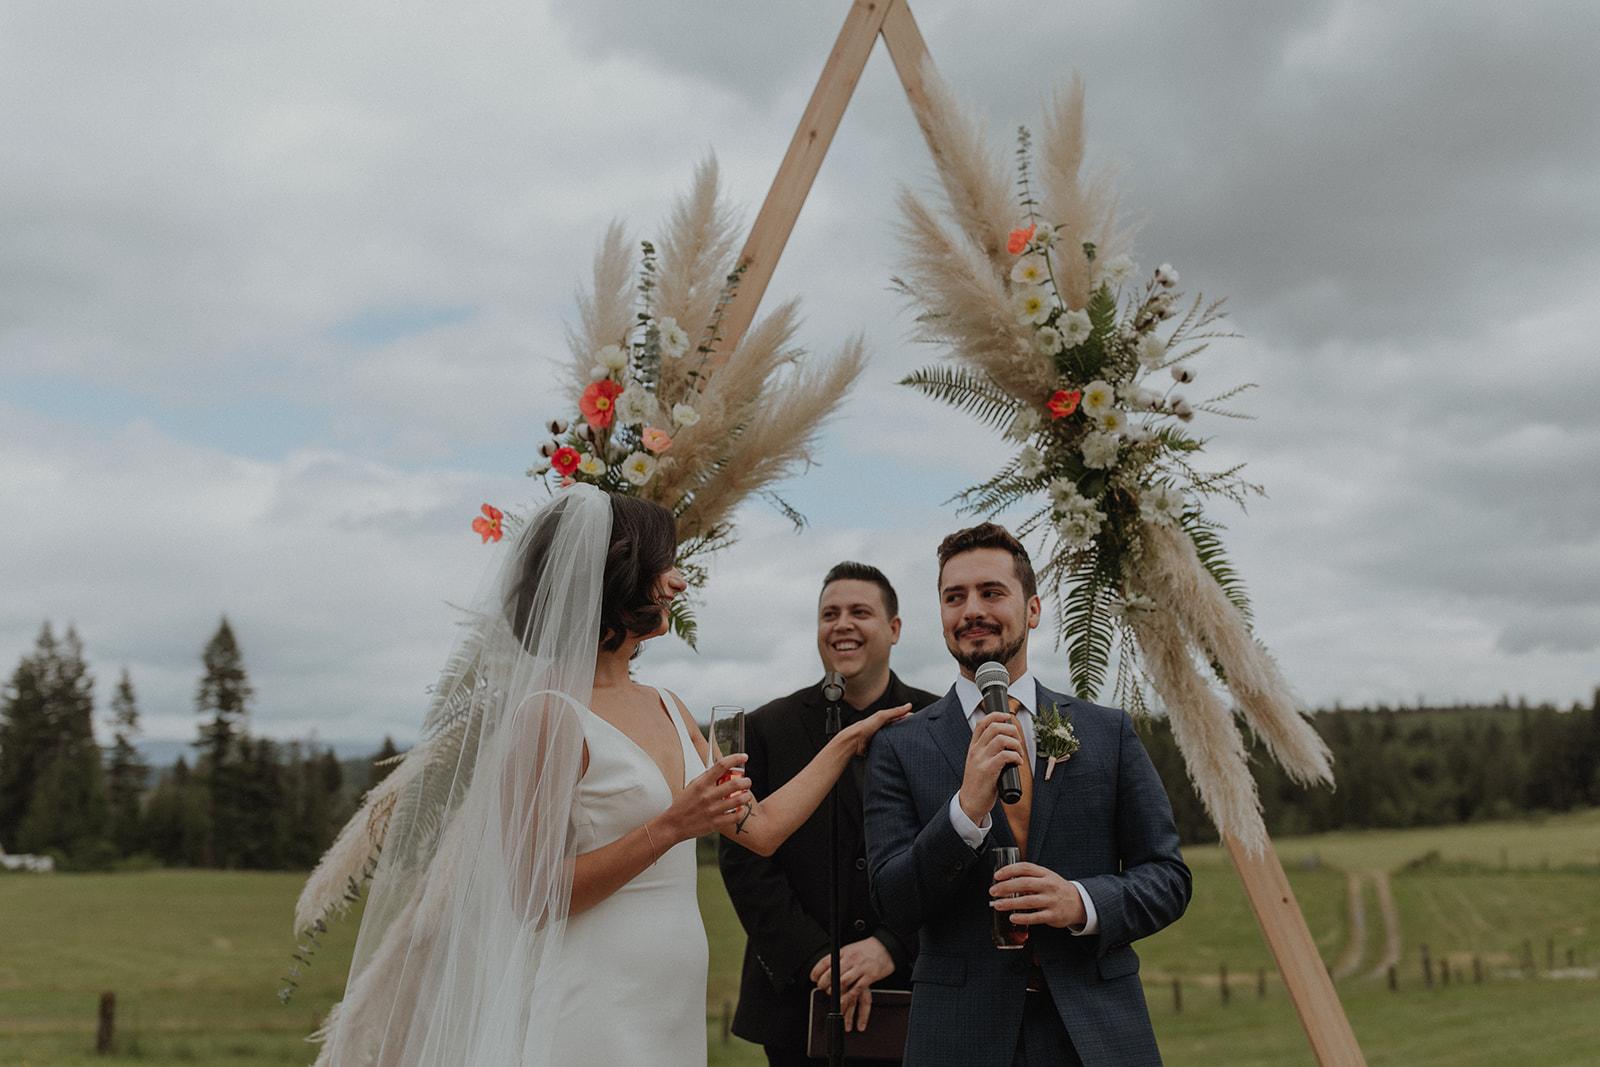 cortney_skye_wedding_june2019-385.jpg